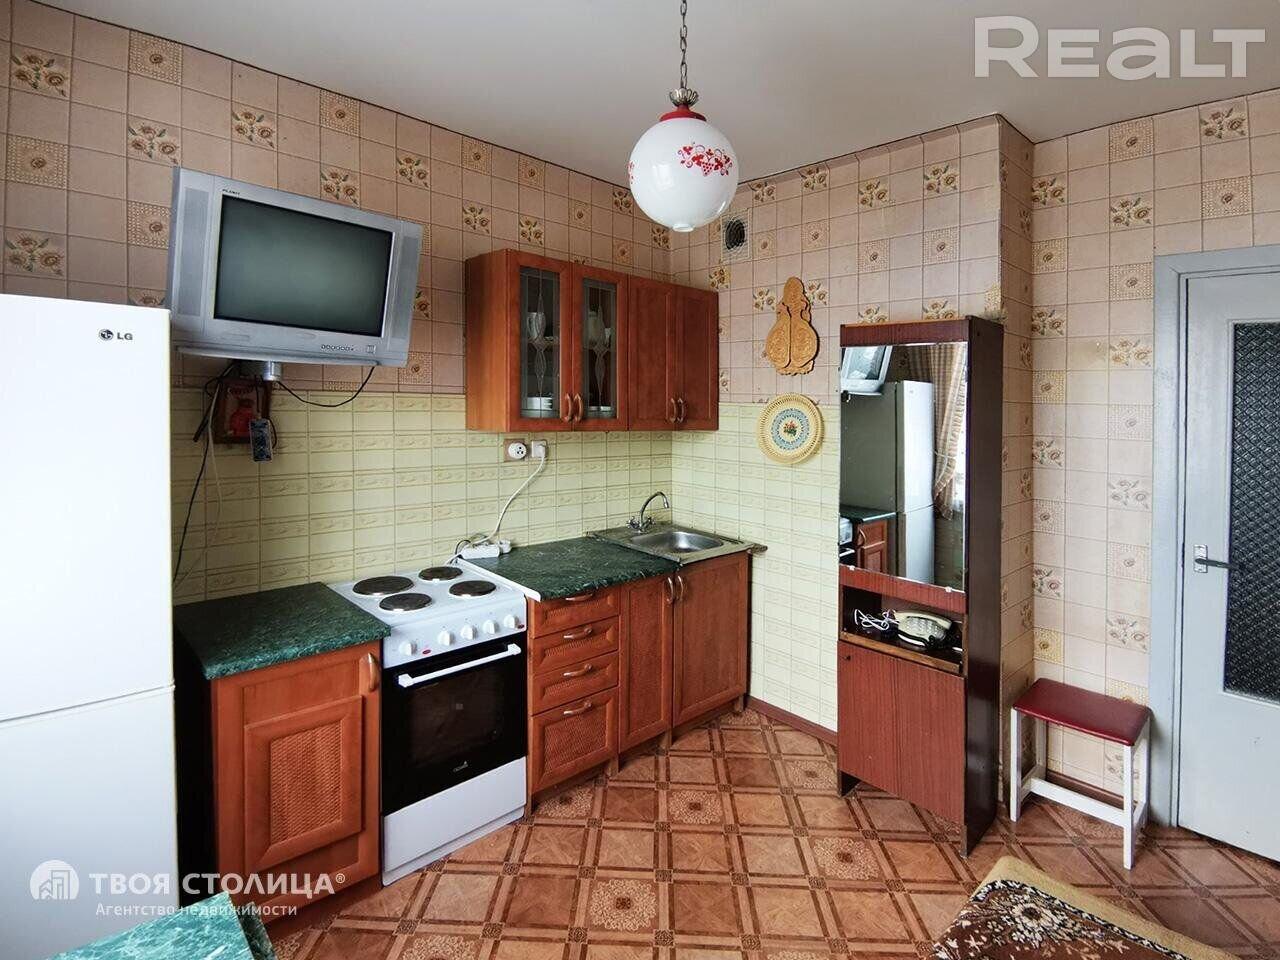 Продажа 2-х комнатной квартиры в г. Минске, ул. Есенина, дом 63 (р-н Малиновка). Цена 152 170 руб